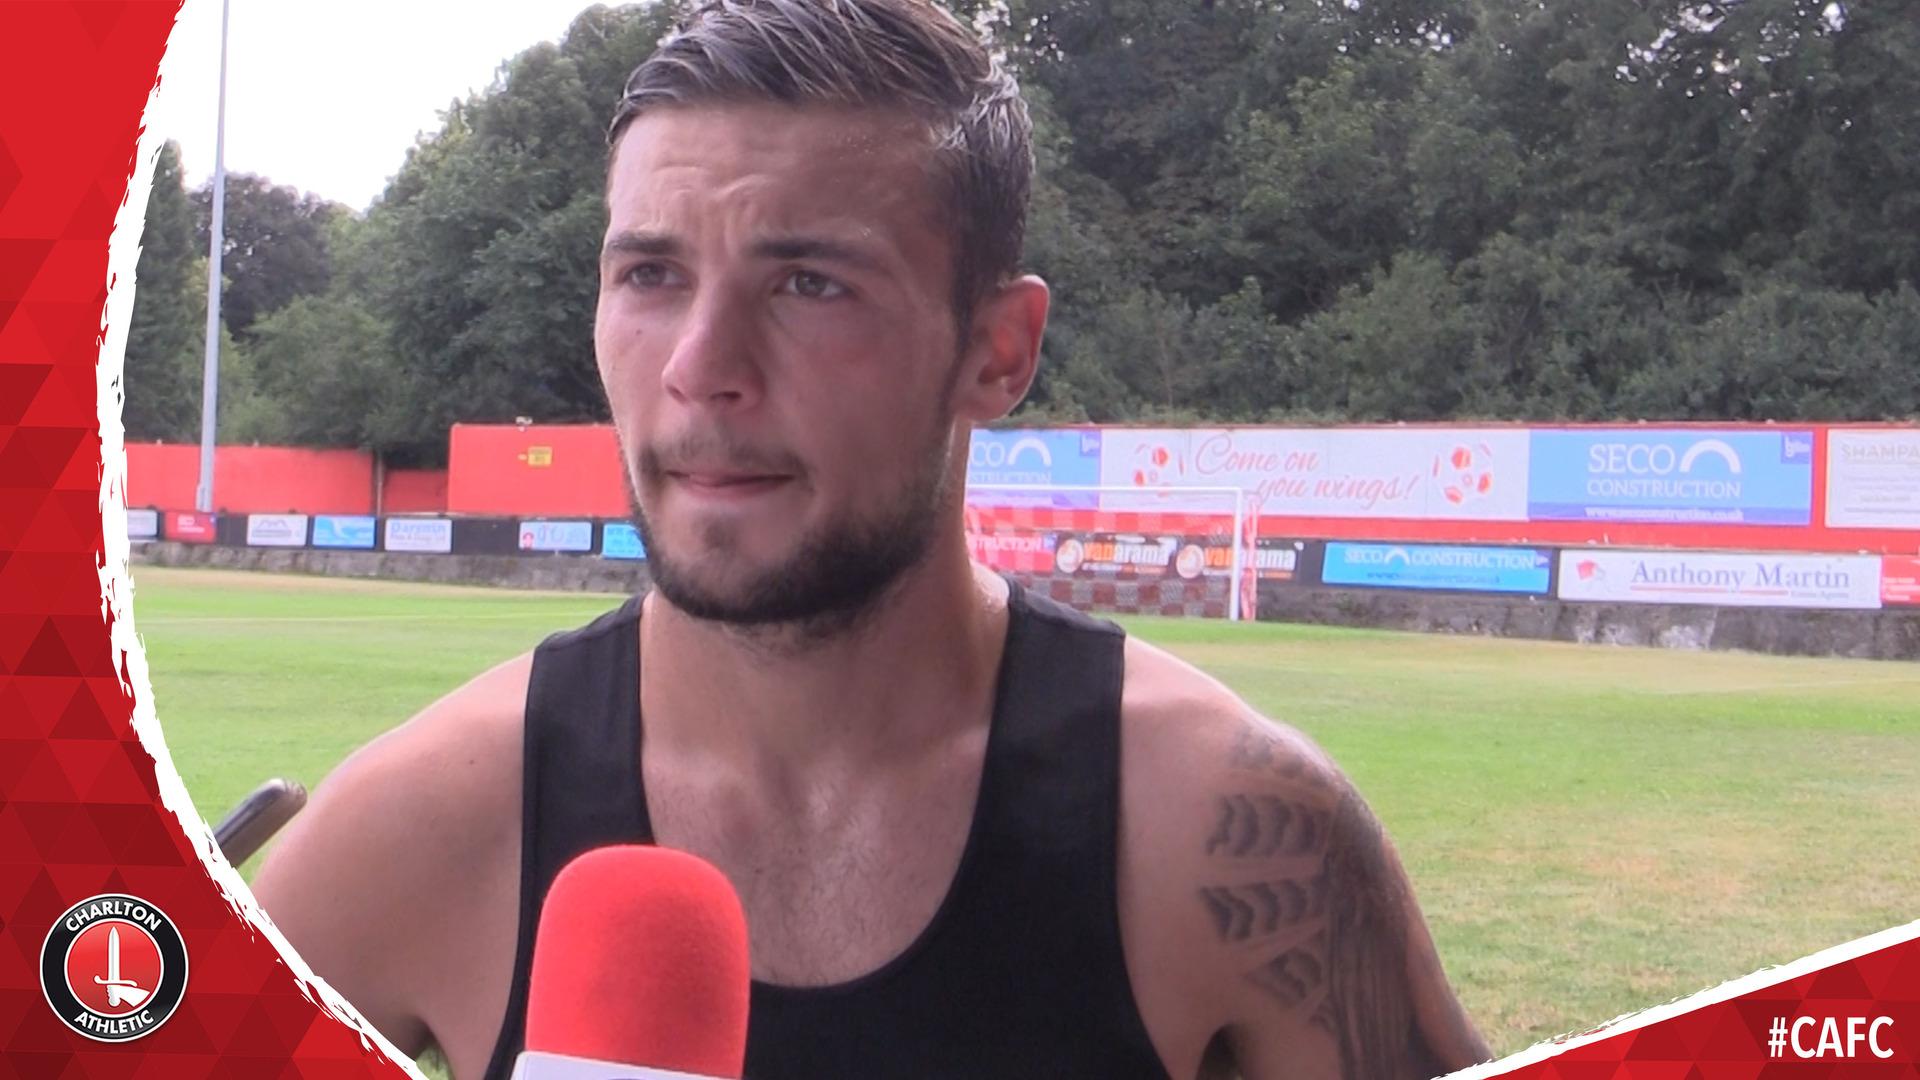 Forster-Caskey: Pre-season games vital for match sharpness